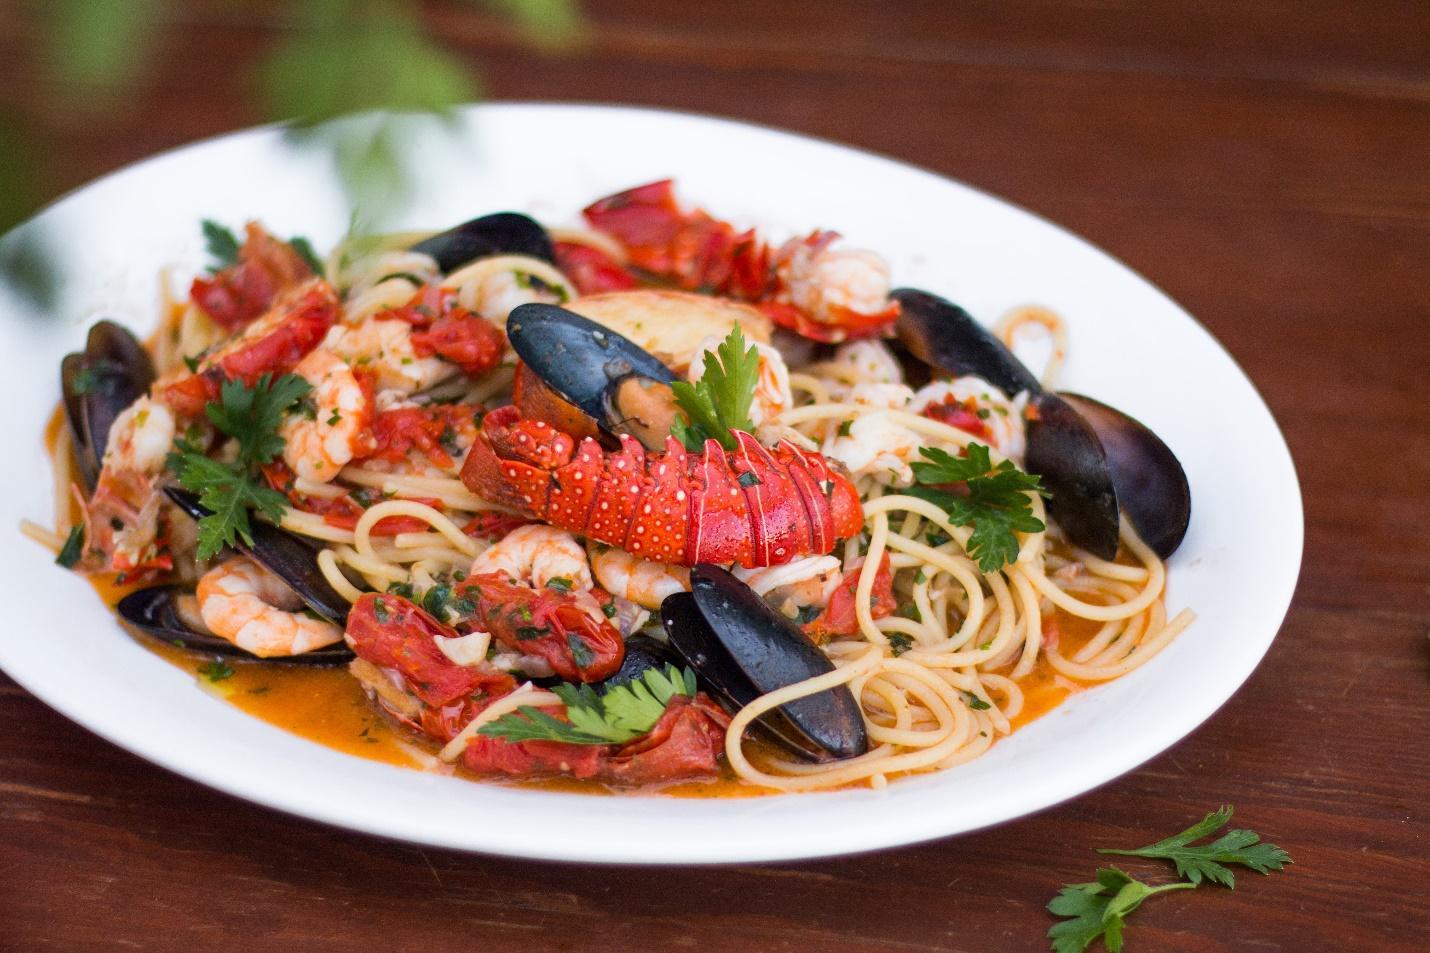 8 Diets for an Effective Weight Loss -  Mediterranean diet